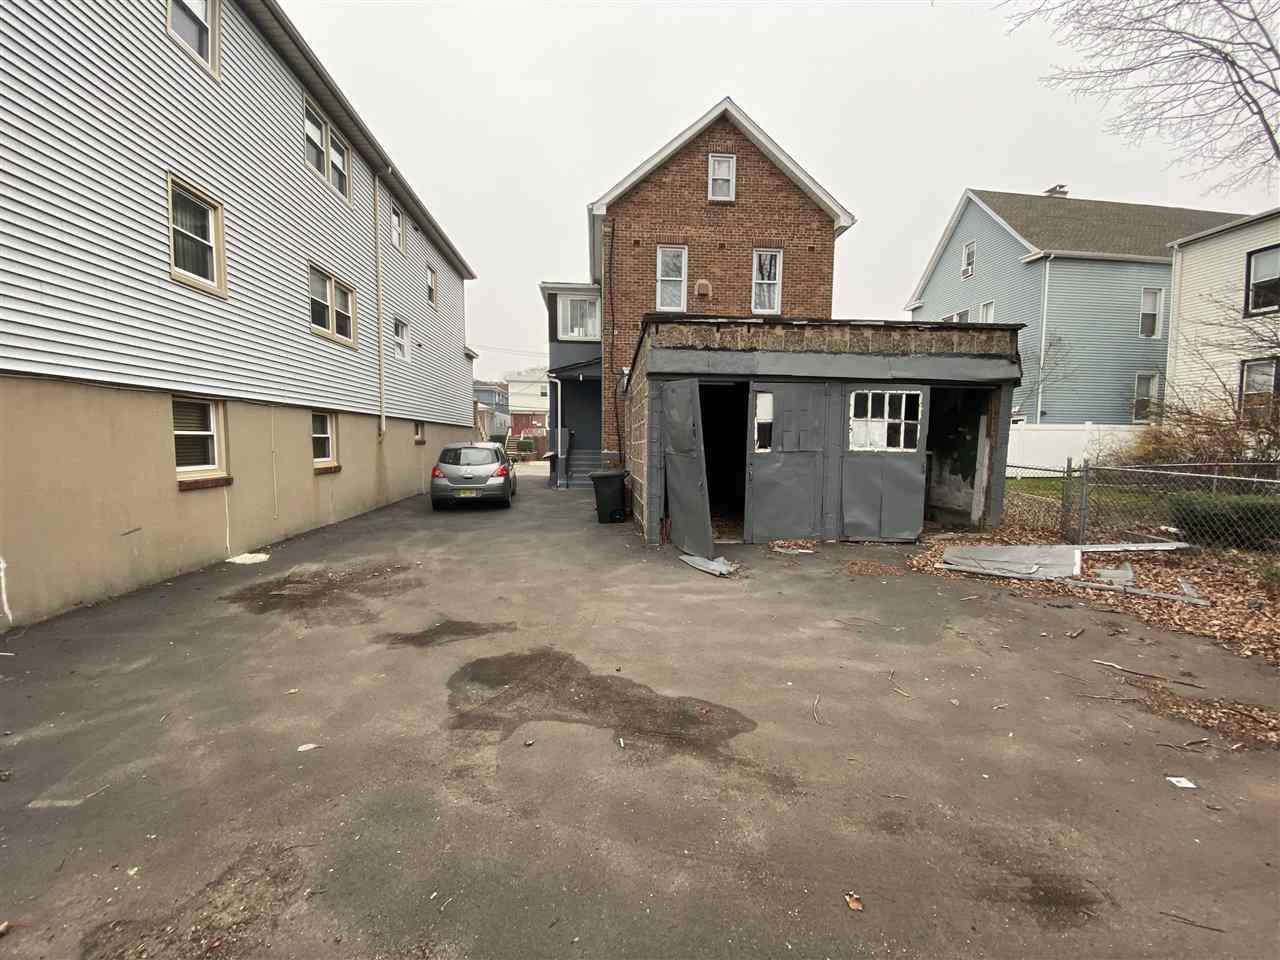 12 JULIETTE ST, Bayonne, New Jersey 07002, 5 Bedrooms Bedrooms, ,2 BathroomsBathrooms,Multifamily,For Sale,12 JULIETTE ST,210000343